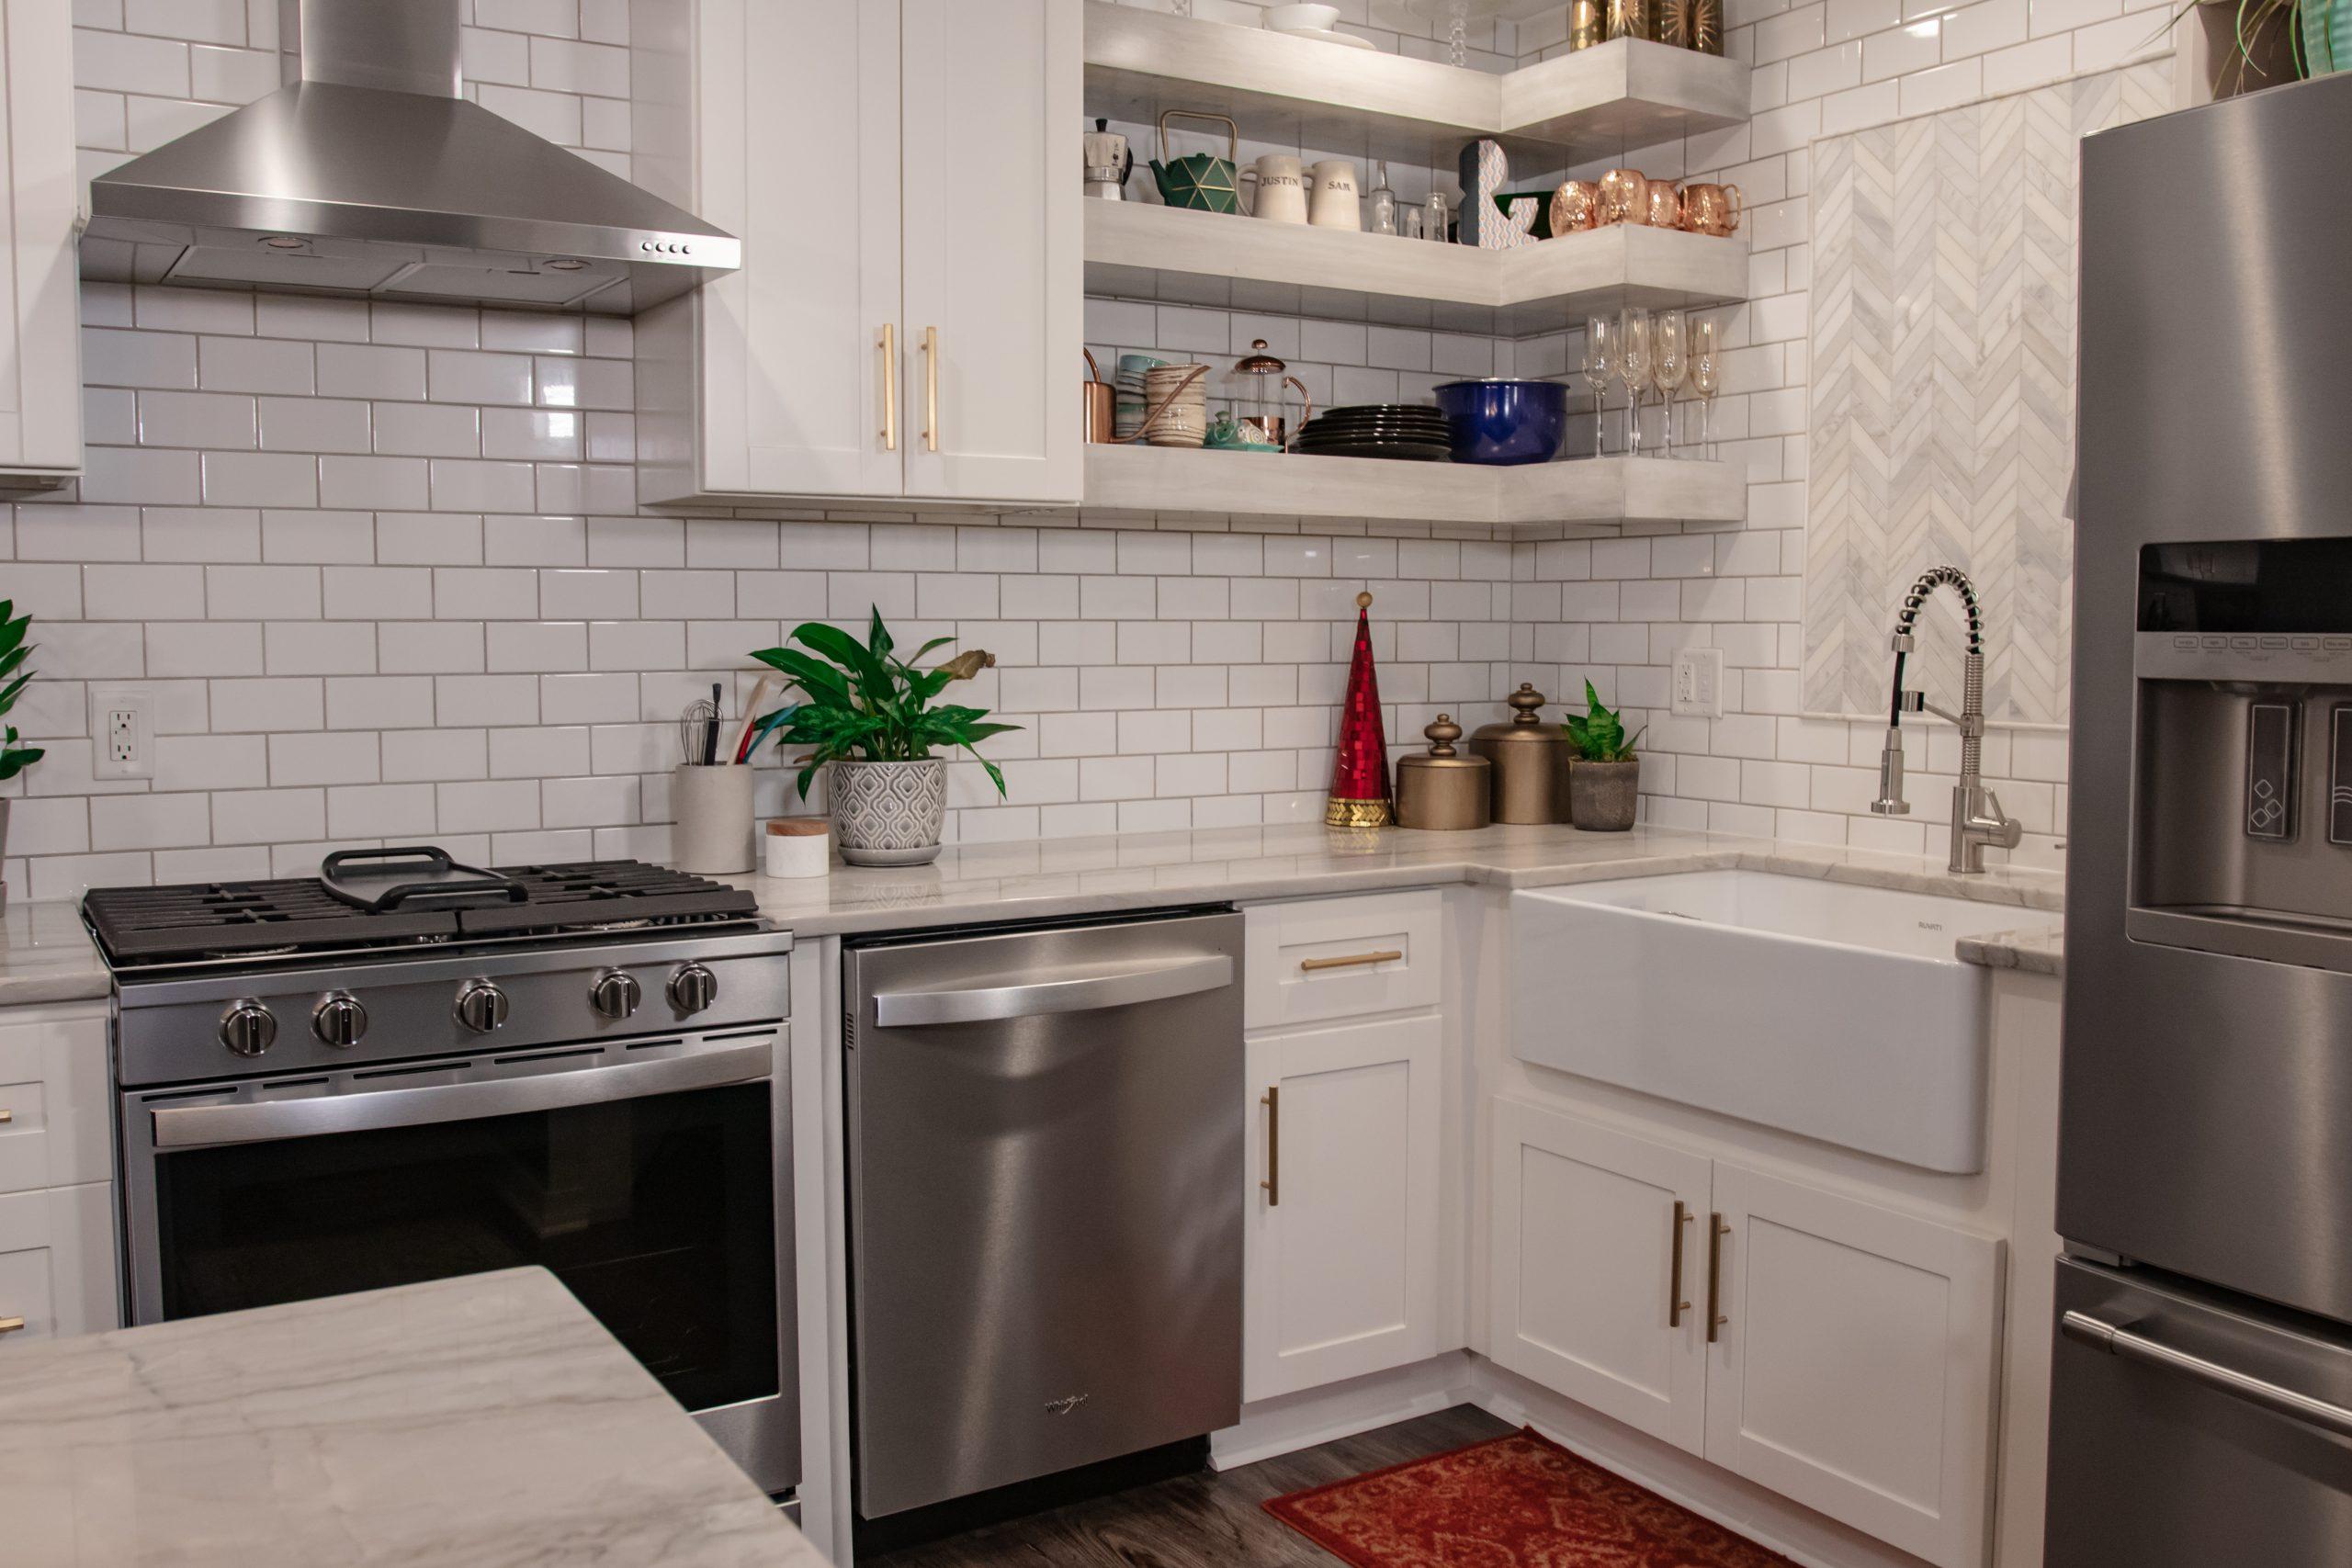 Kitchen2 scaled